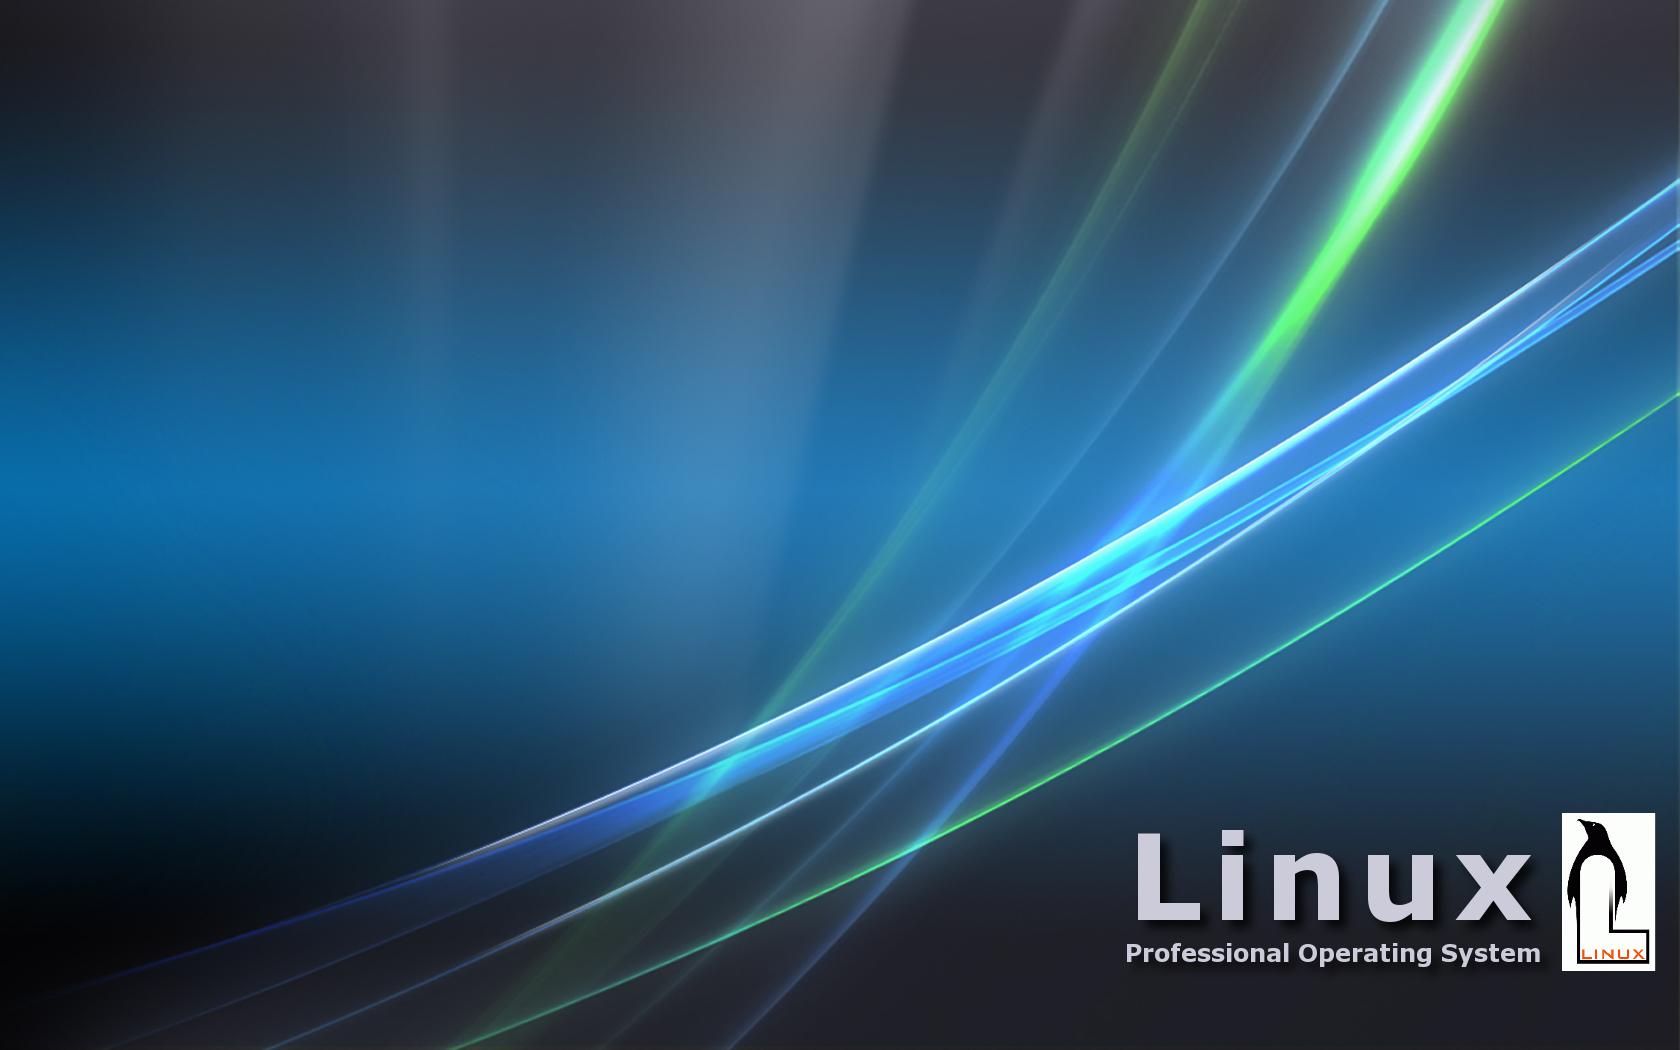 Wallpaper downloads download wallpaper Linux with Vista design 1680x1050